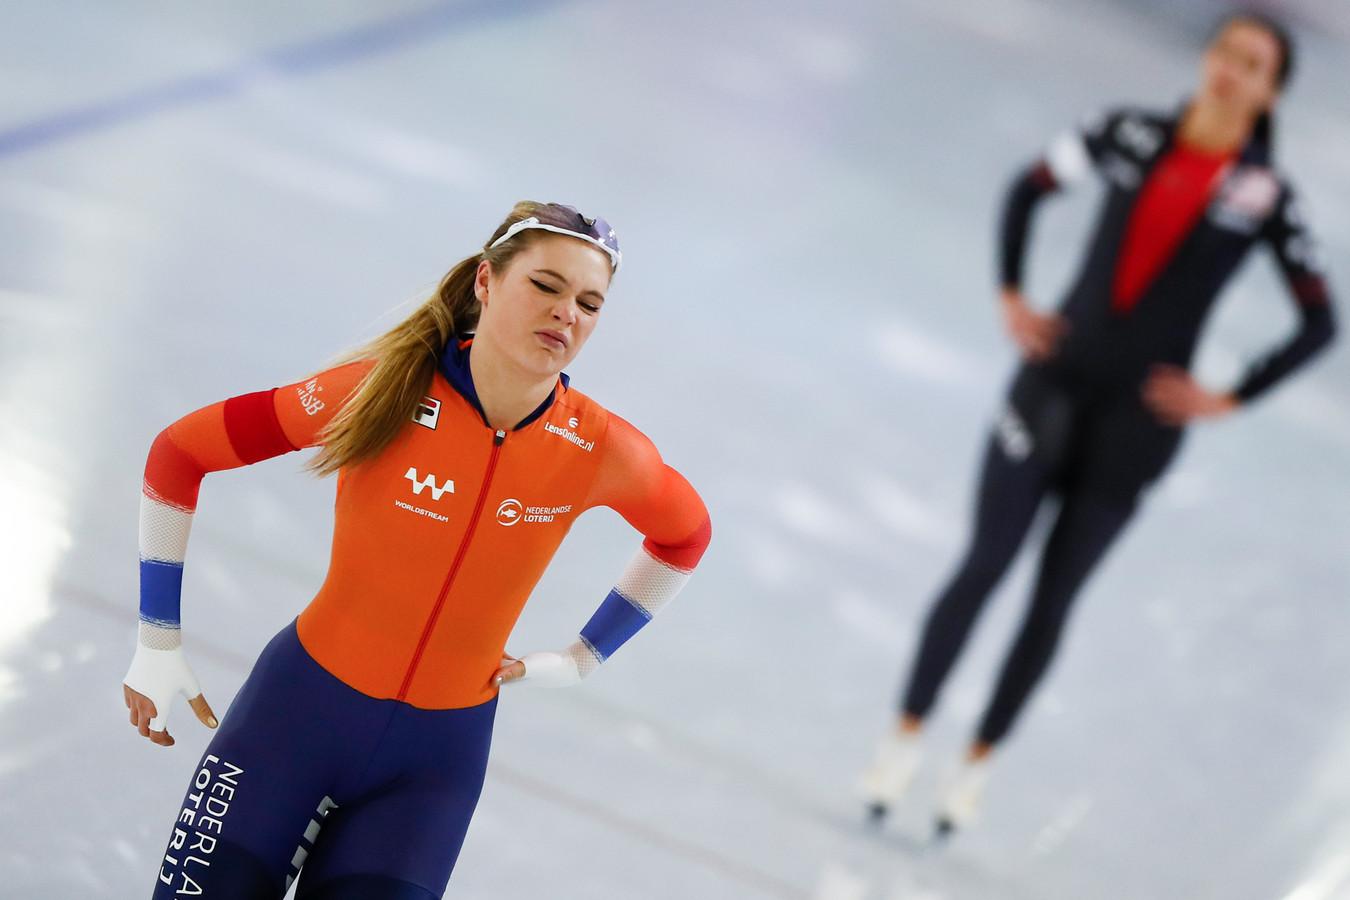 Jutta Leerdam baalt. Op de achtergrond Bittany Bowe.